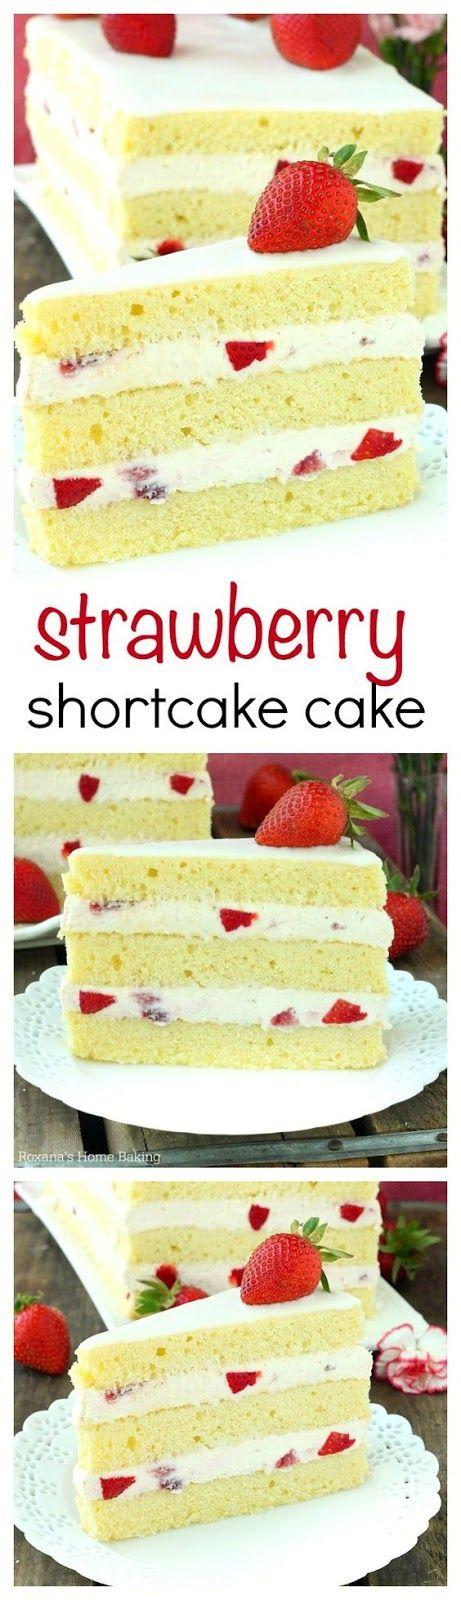 STRAWBERRY SHORTCAKE CAKE RECIPE   Cake And Food Recipe